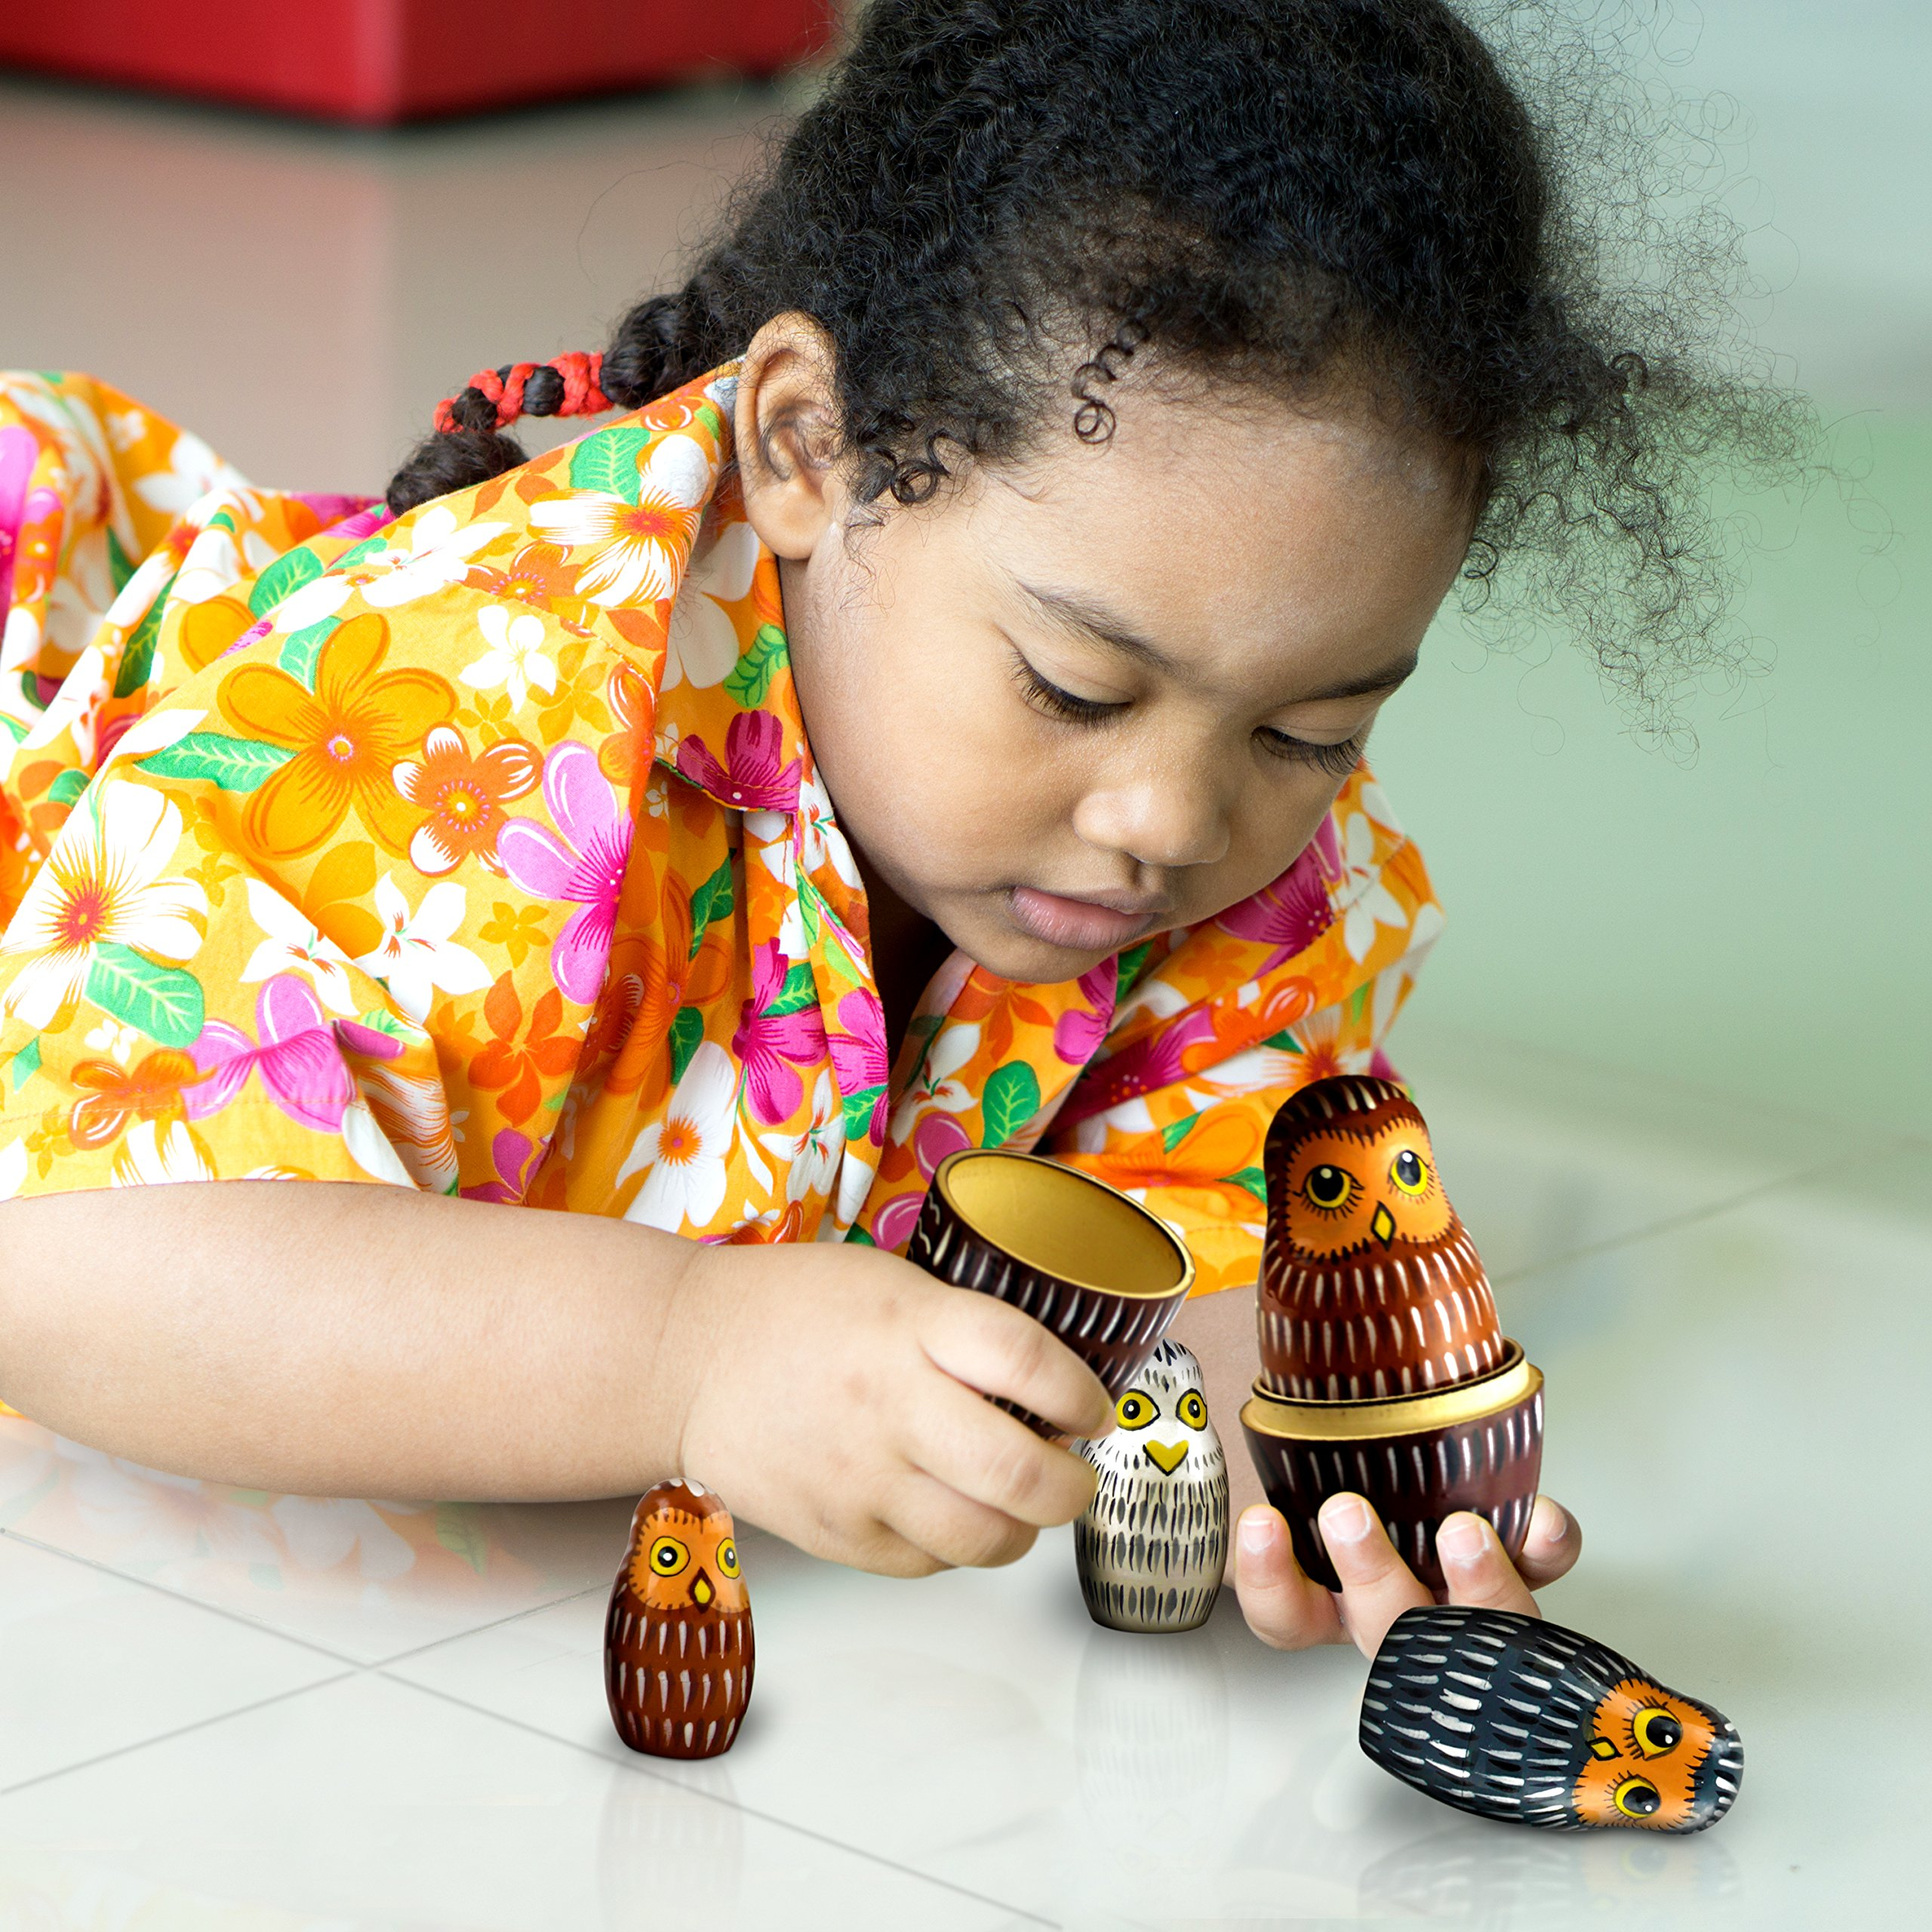 Owl Nesting Dolls - Owl Decor - Owl Gifts - Owl Toy - Matryoshka set 7 dolls by MATRYOSHKA&HANDICRAFT (Image #8)